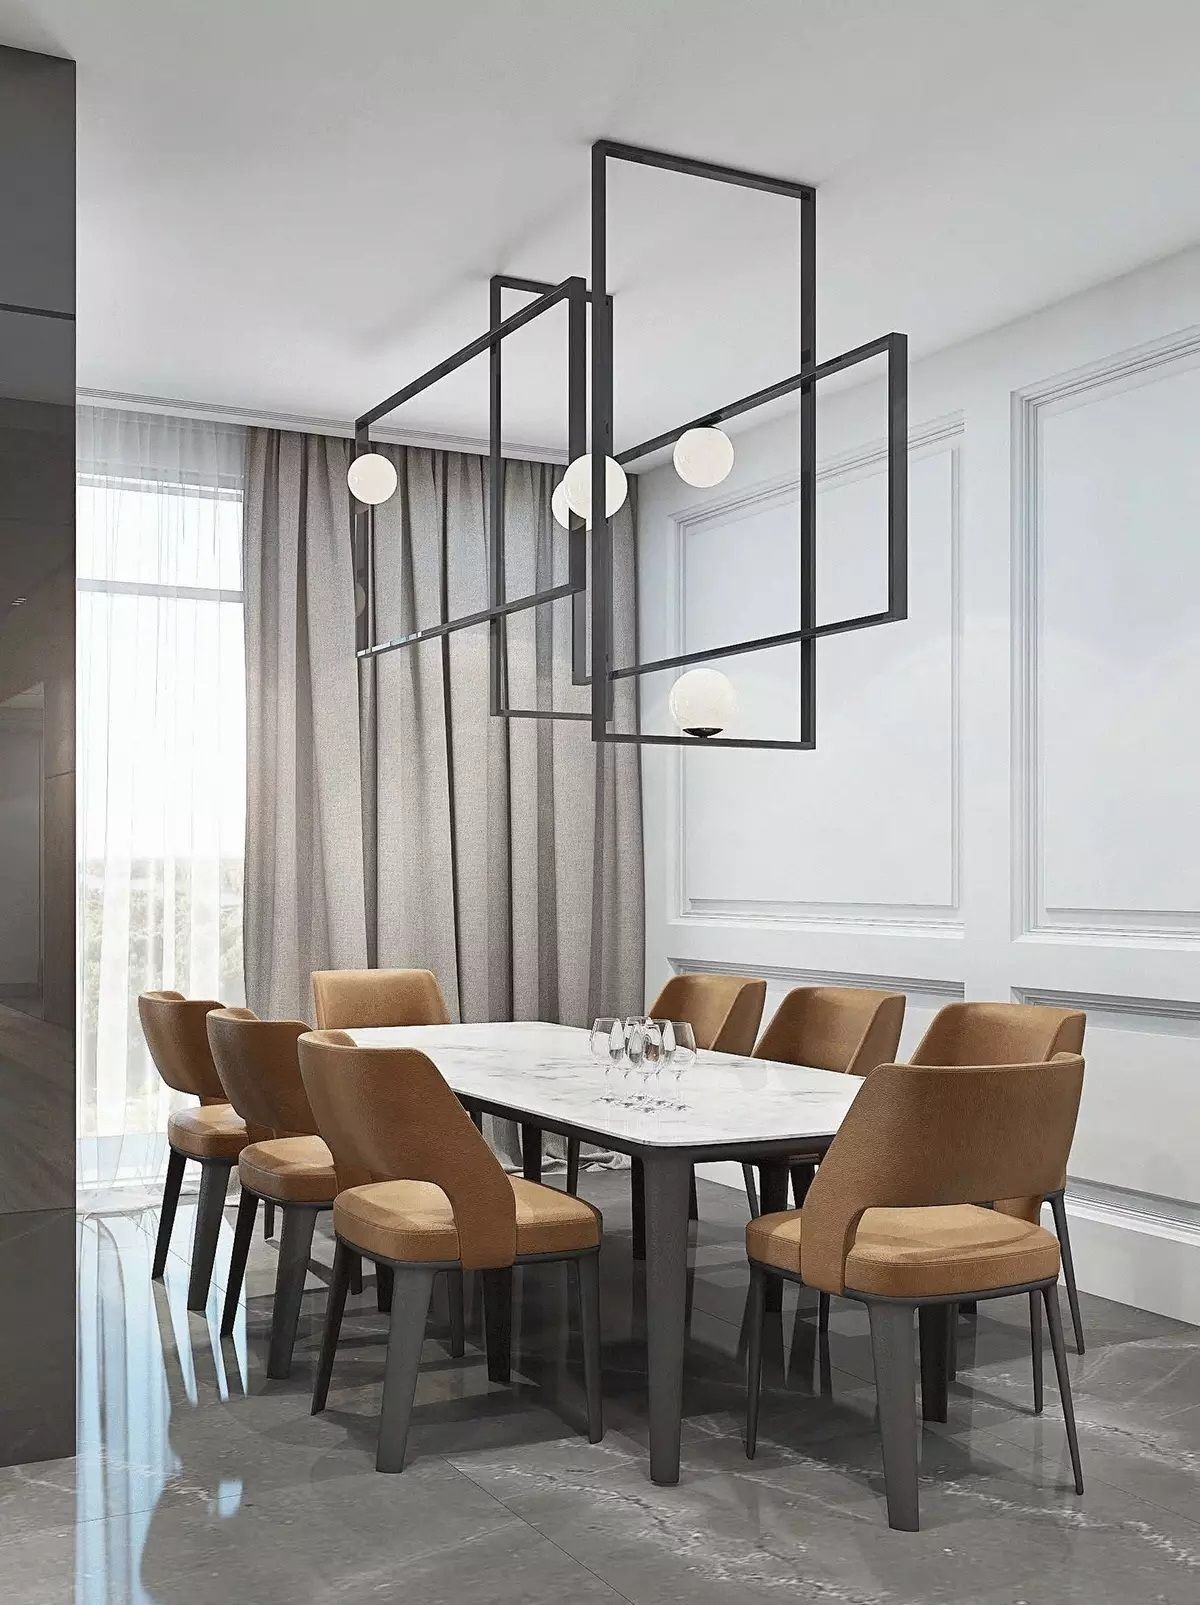 Pin di Alina su 餐桌饰品 | Pinterest | Lampadari e Illuminazione